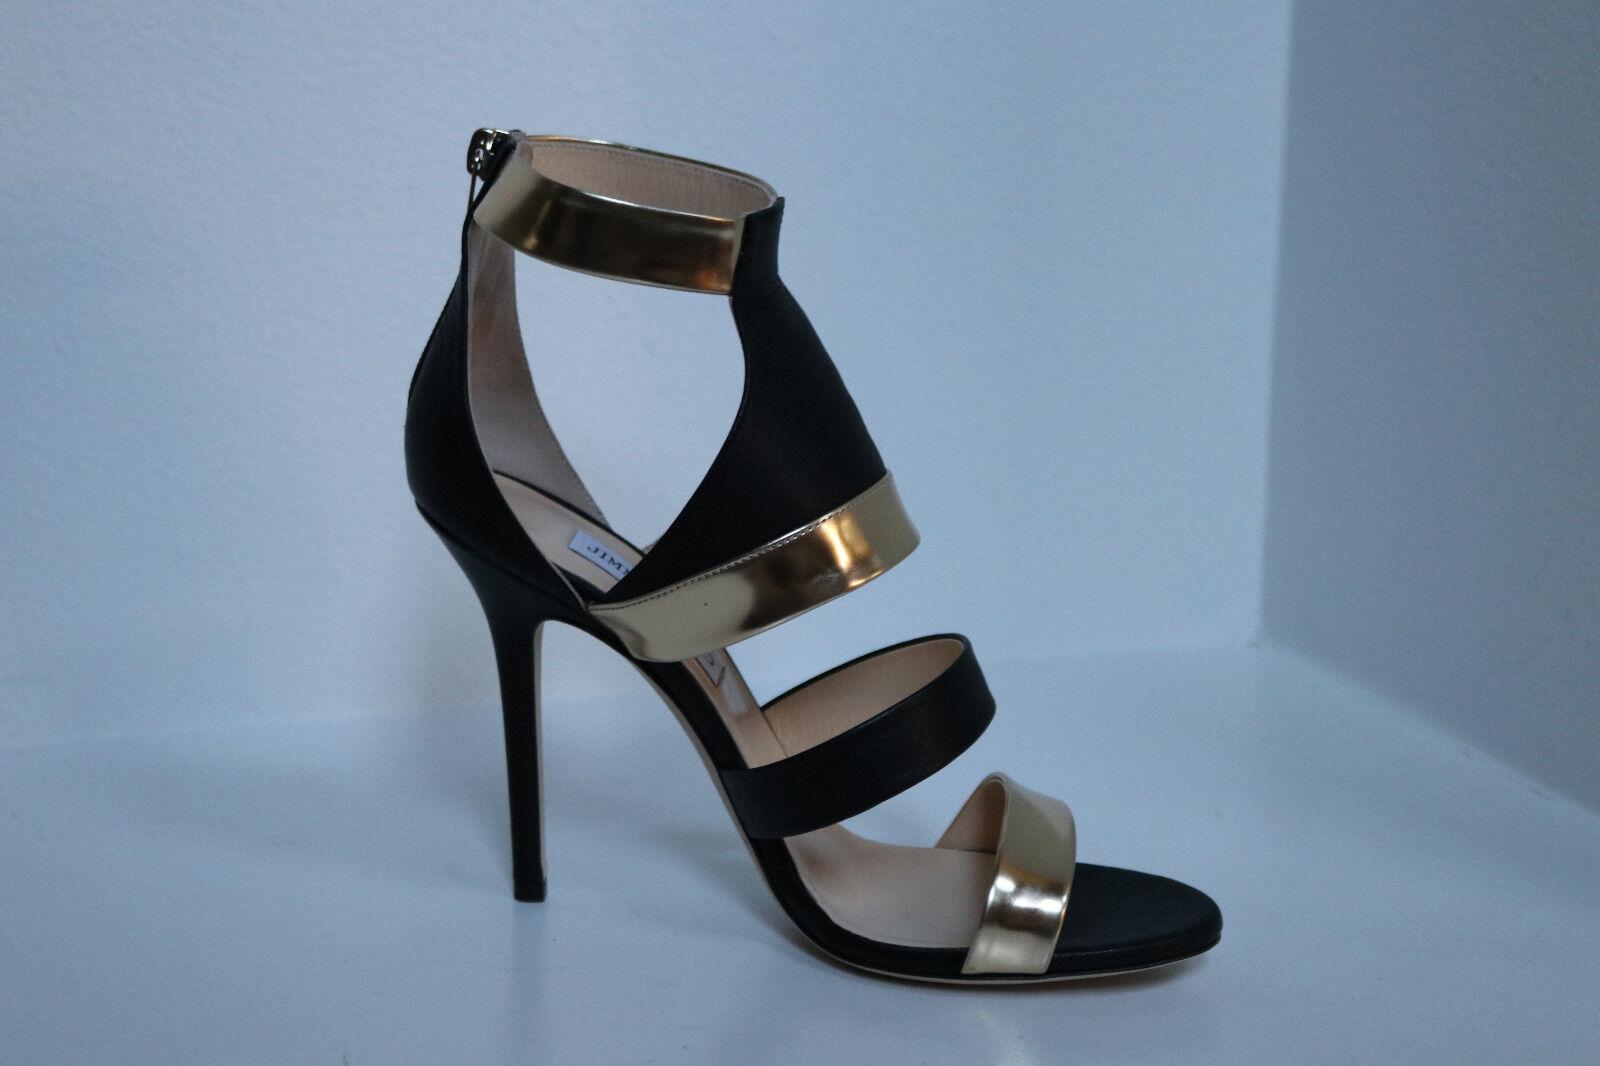 New sz 9.5   39.5 Jimmy Choo Choo Choo Besso Black & gold Leather Ankle Sandal shoes 4539bc